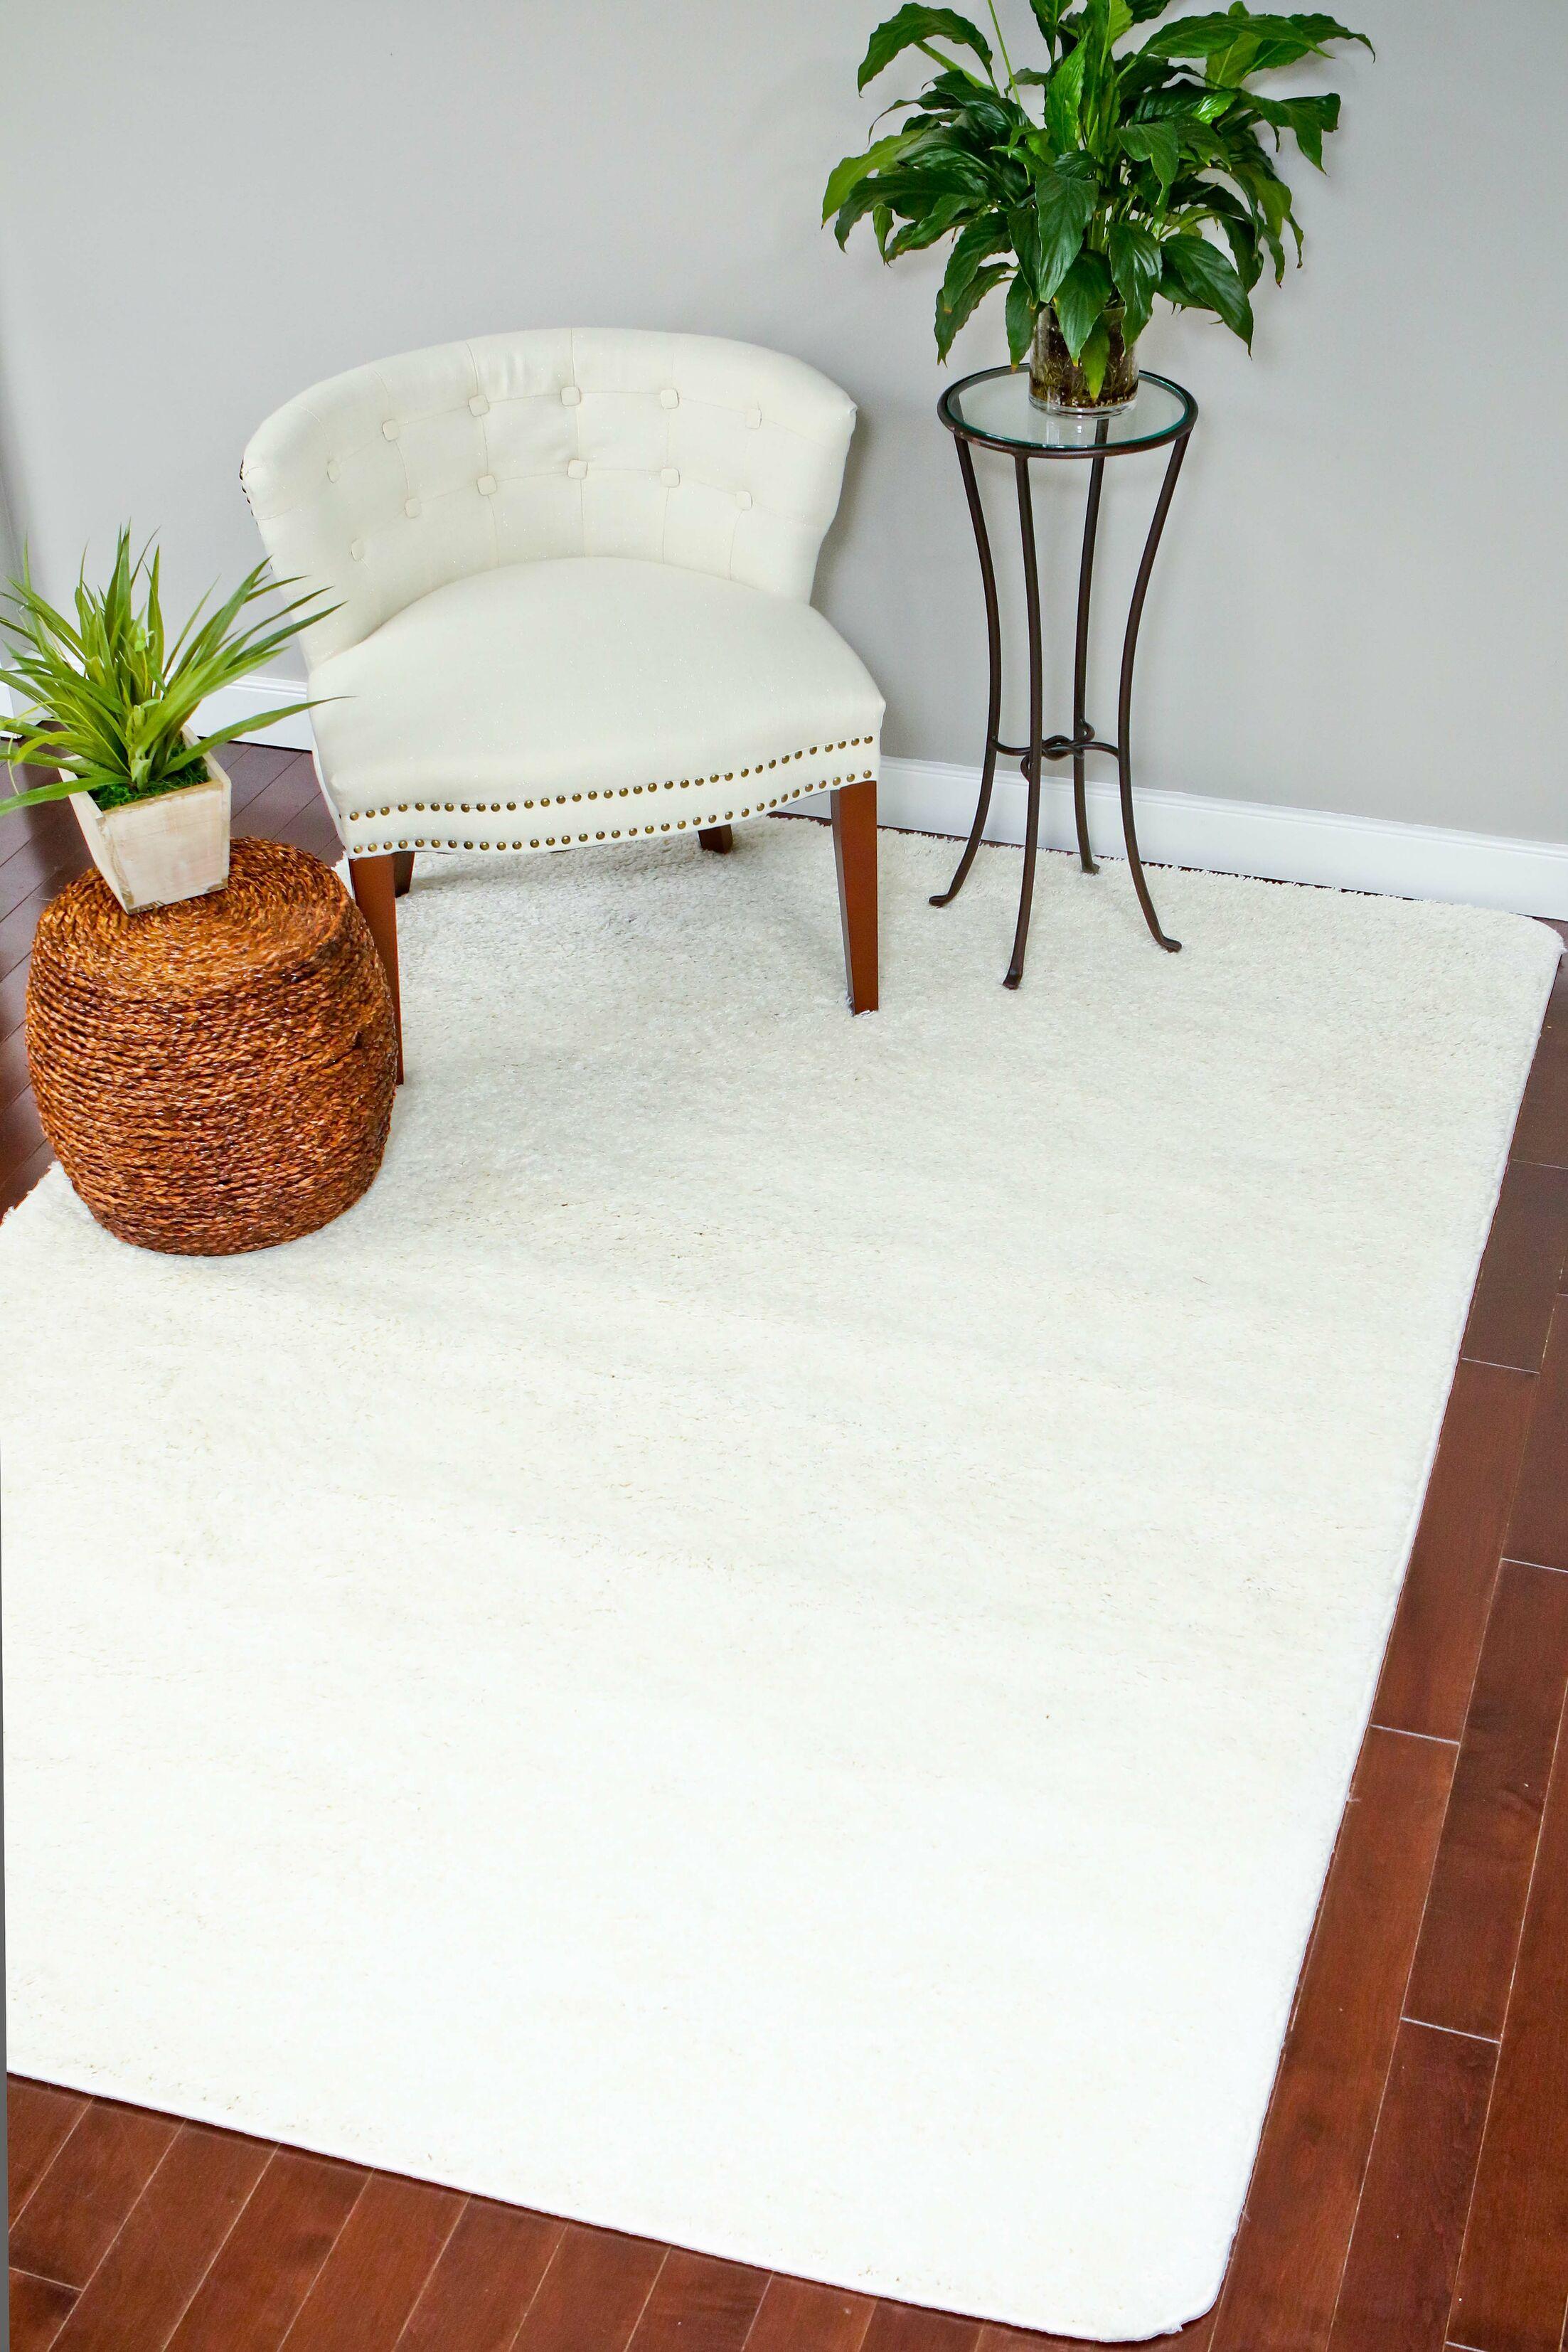 Bennet Shag Plain White Area Rug Rug Size: Rectangle 7' x 10'